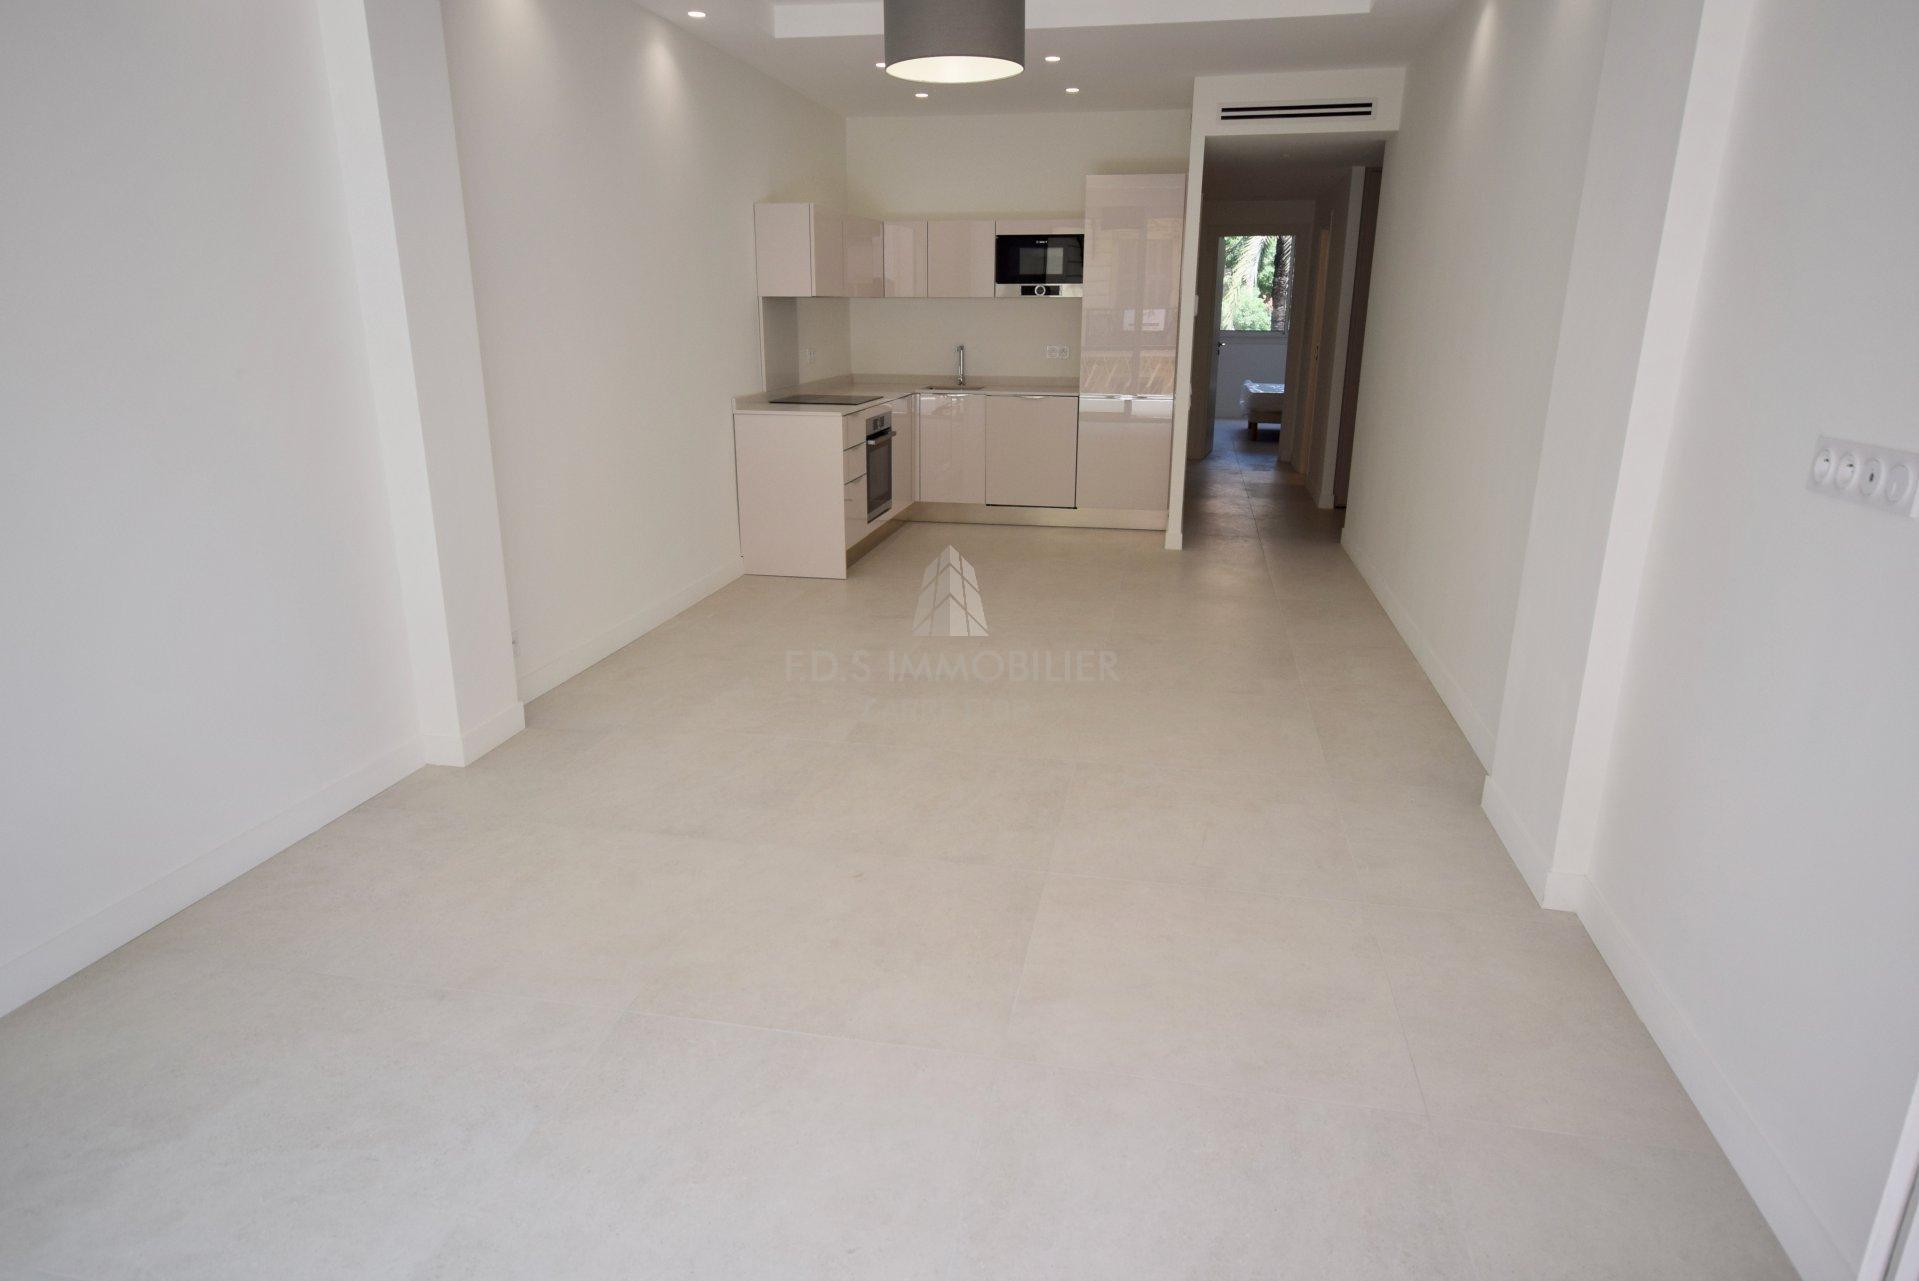 Vendita Appartamento - Nizza (Nice) Rue de France